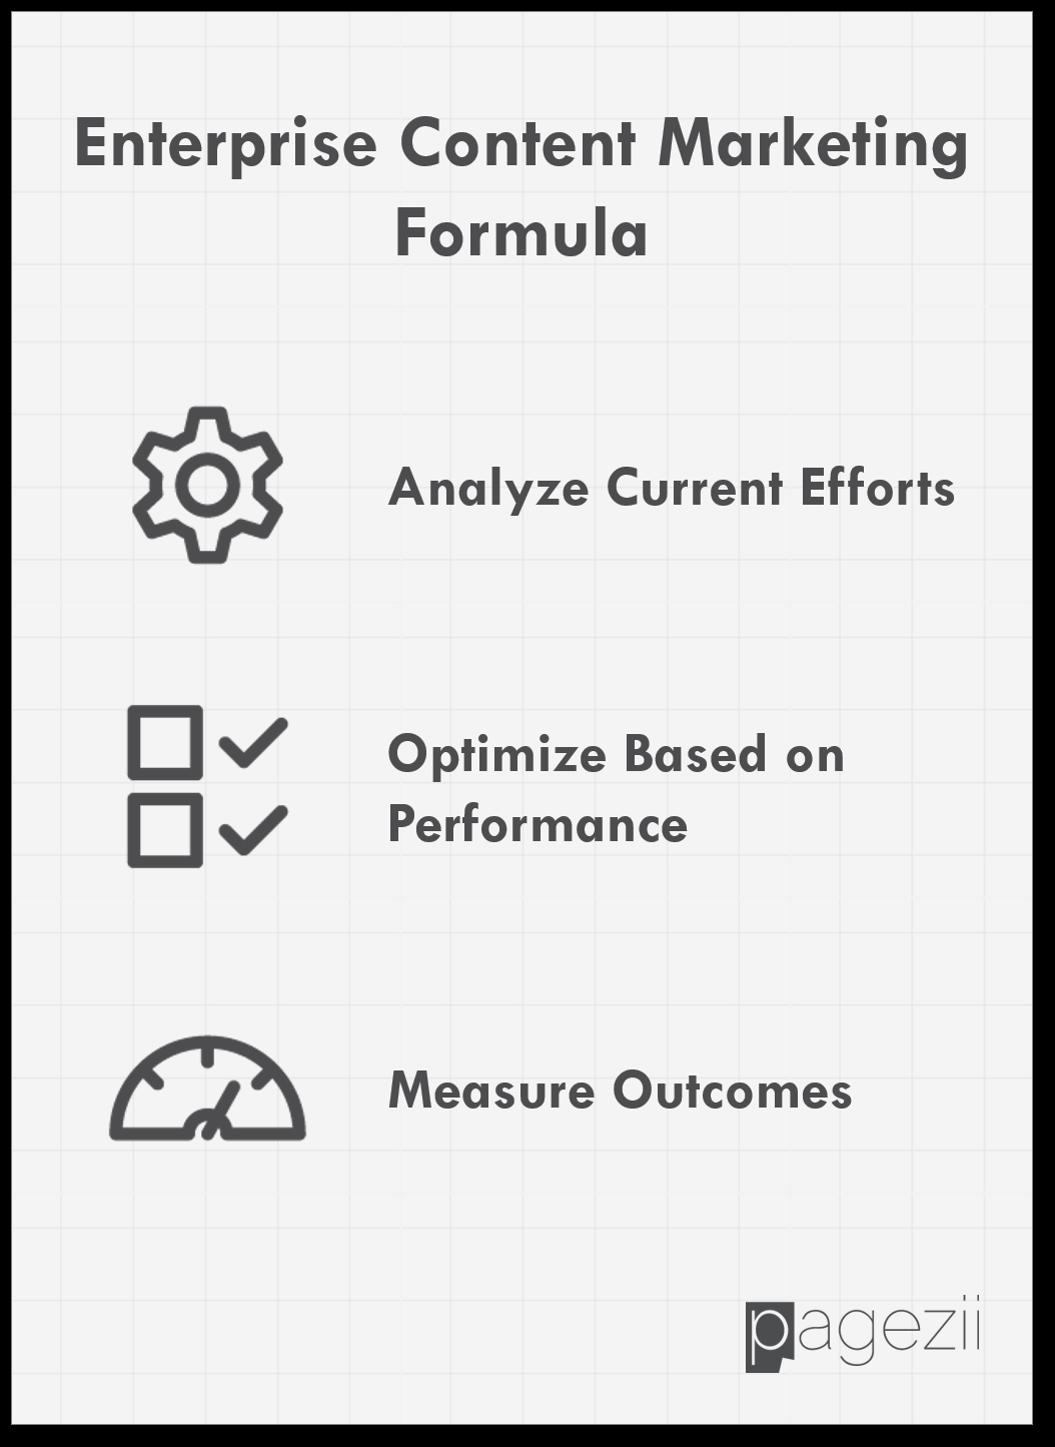 Enterprise-Content-Marketing-Formula-Pagezii-Digital-Marketing